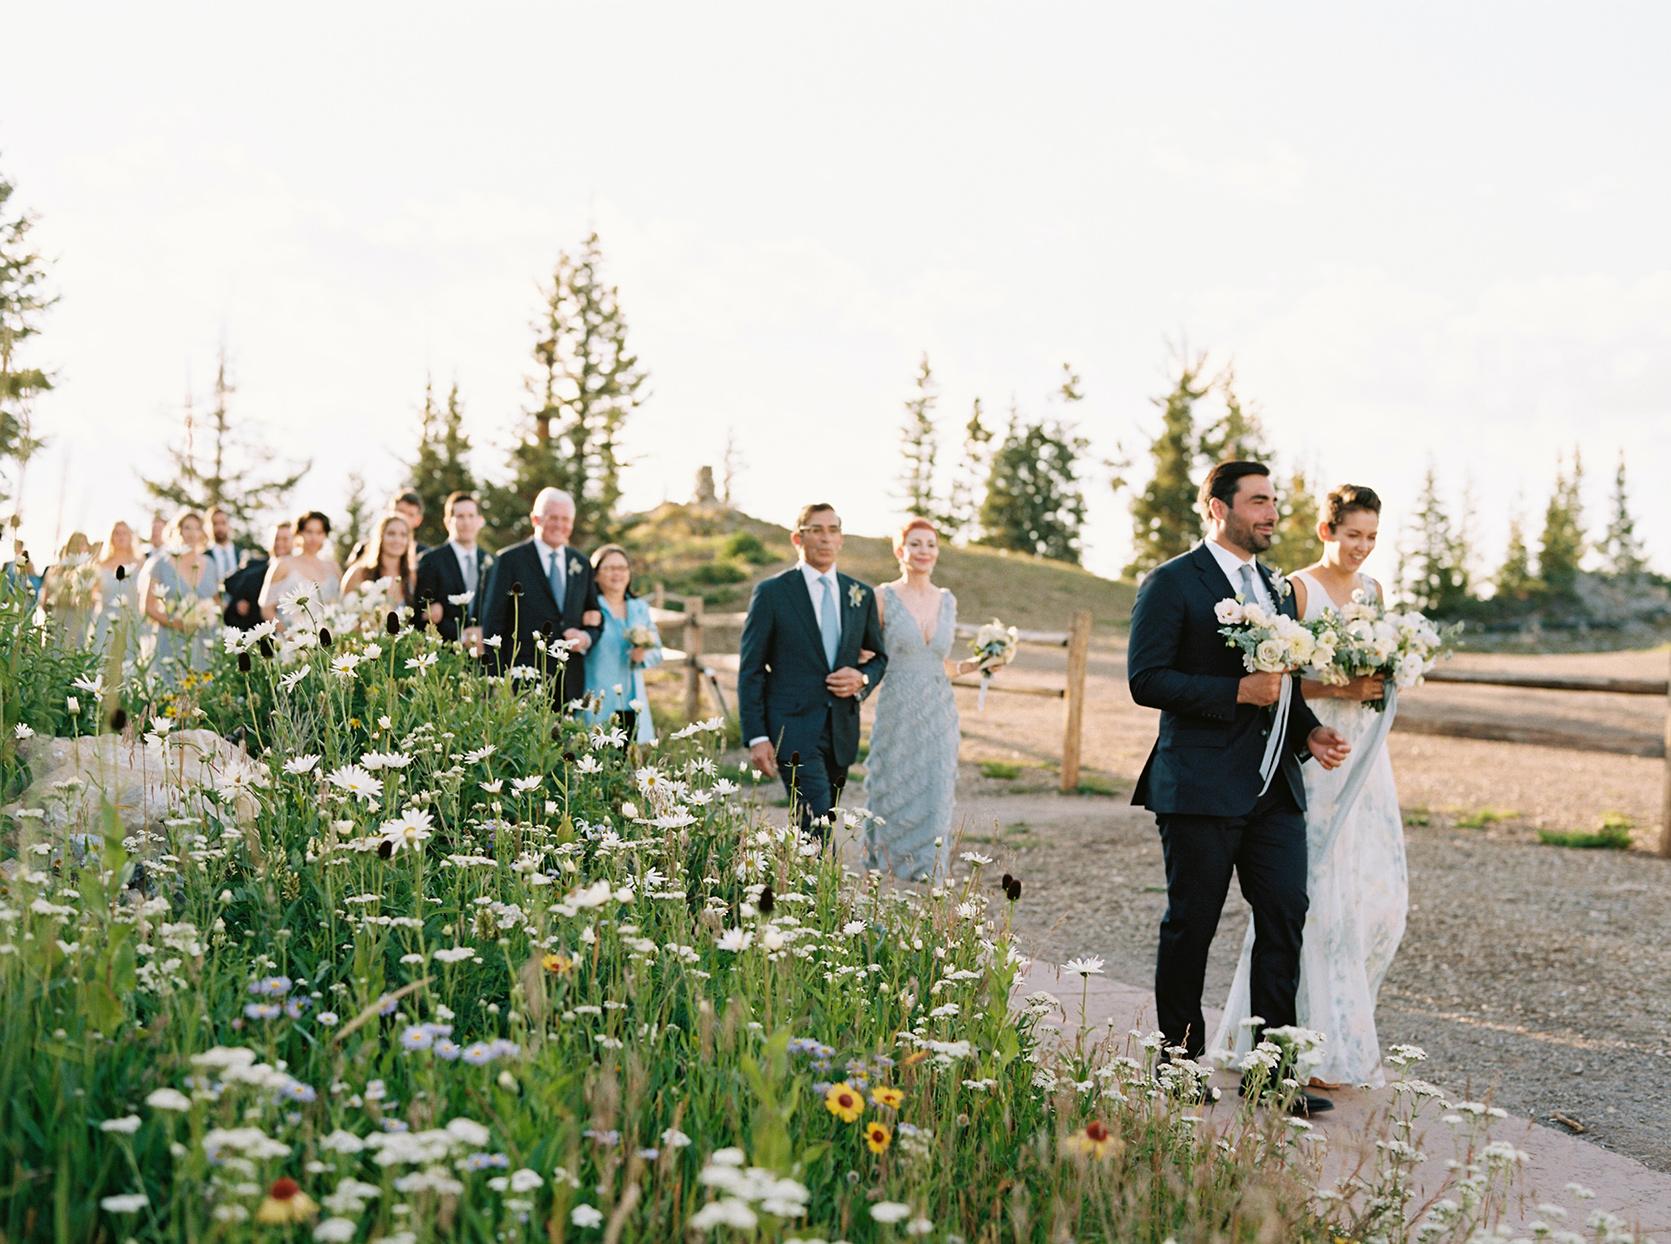 kimmie mike wedding guests walking by flower field